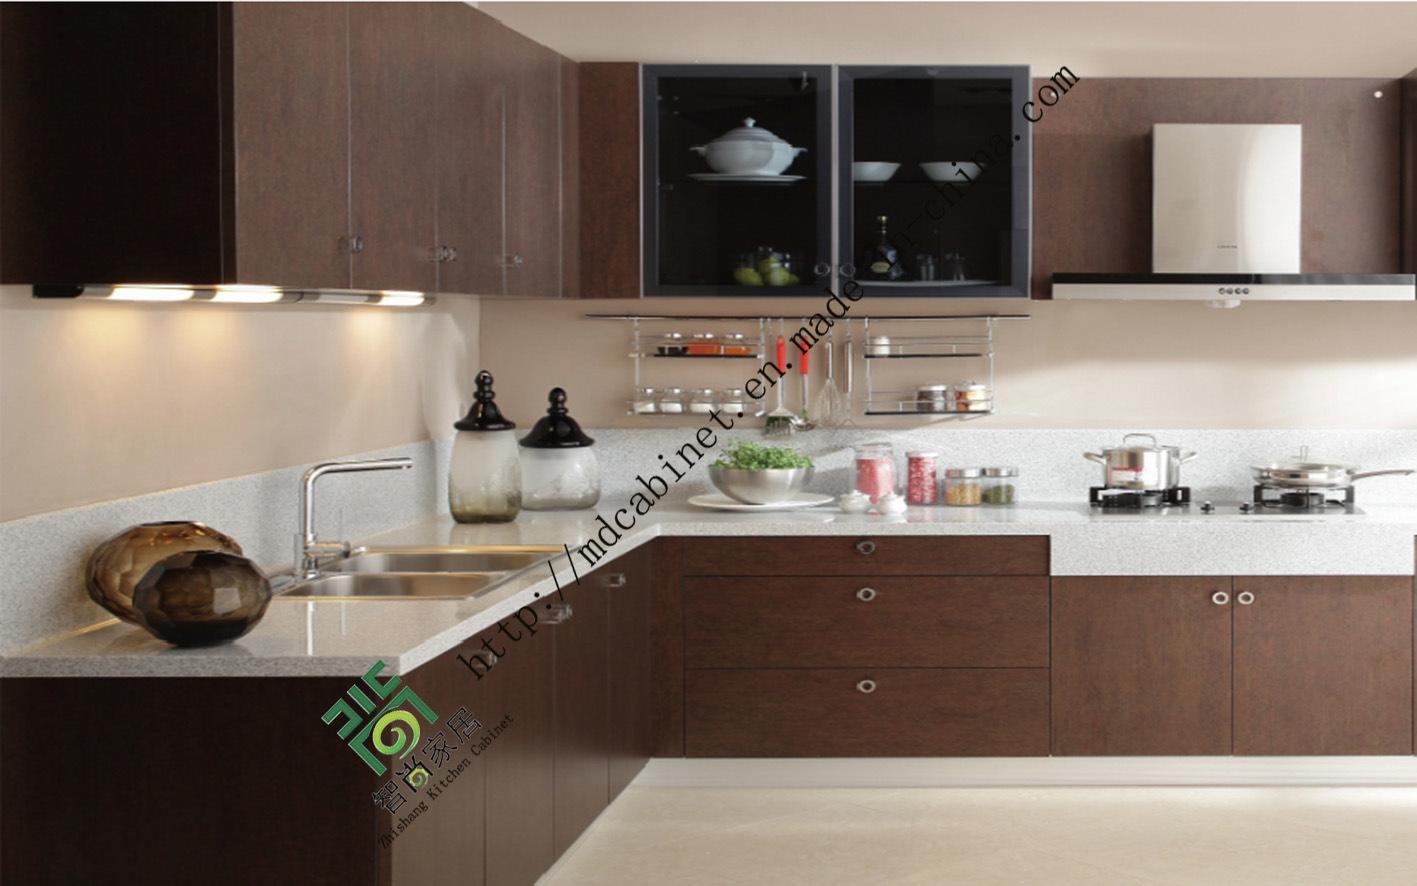 ... Mdf Board For Kitchen Cabinets | Memsaheb.net On Mdf Wood, Mdf Powder  Coating ...